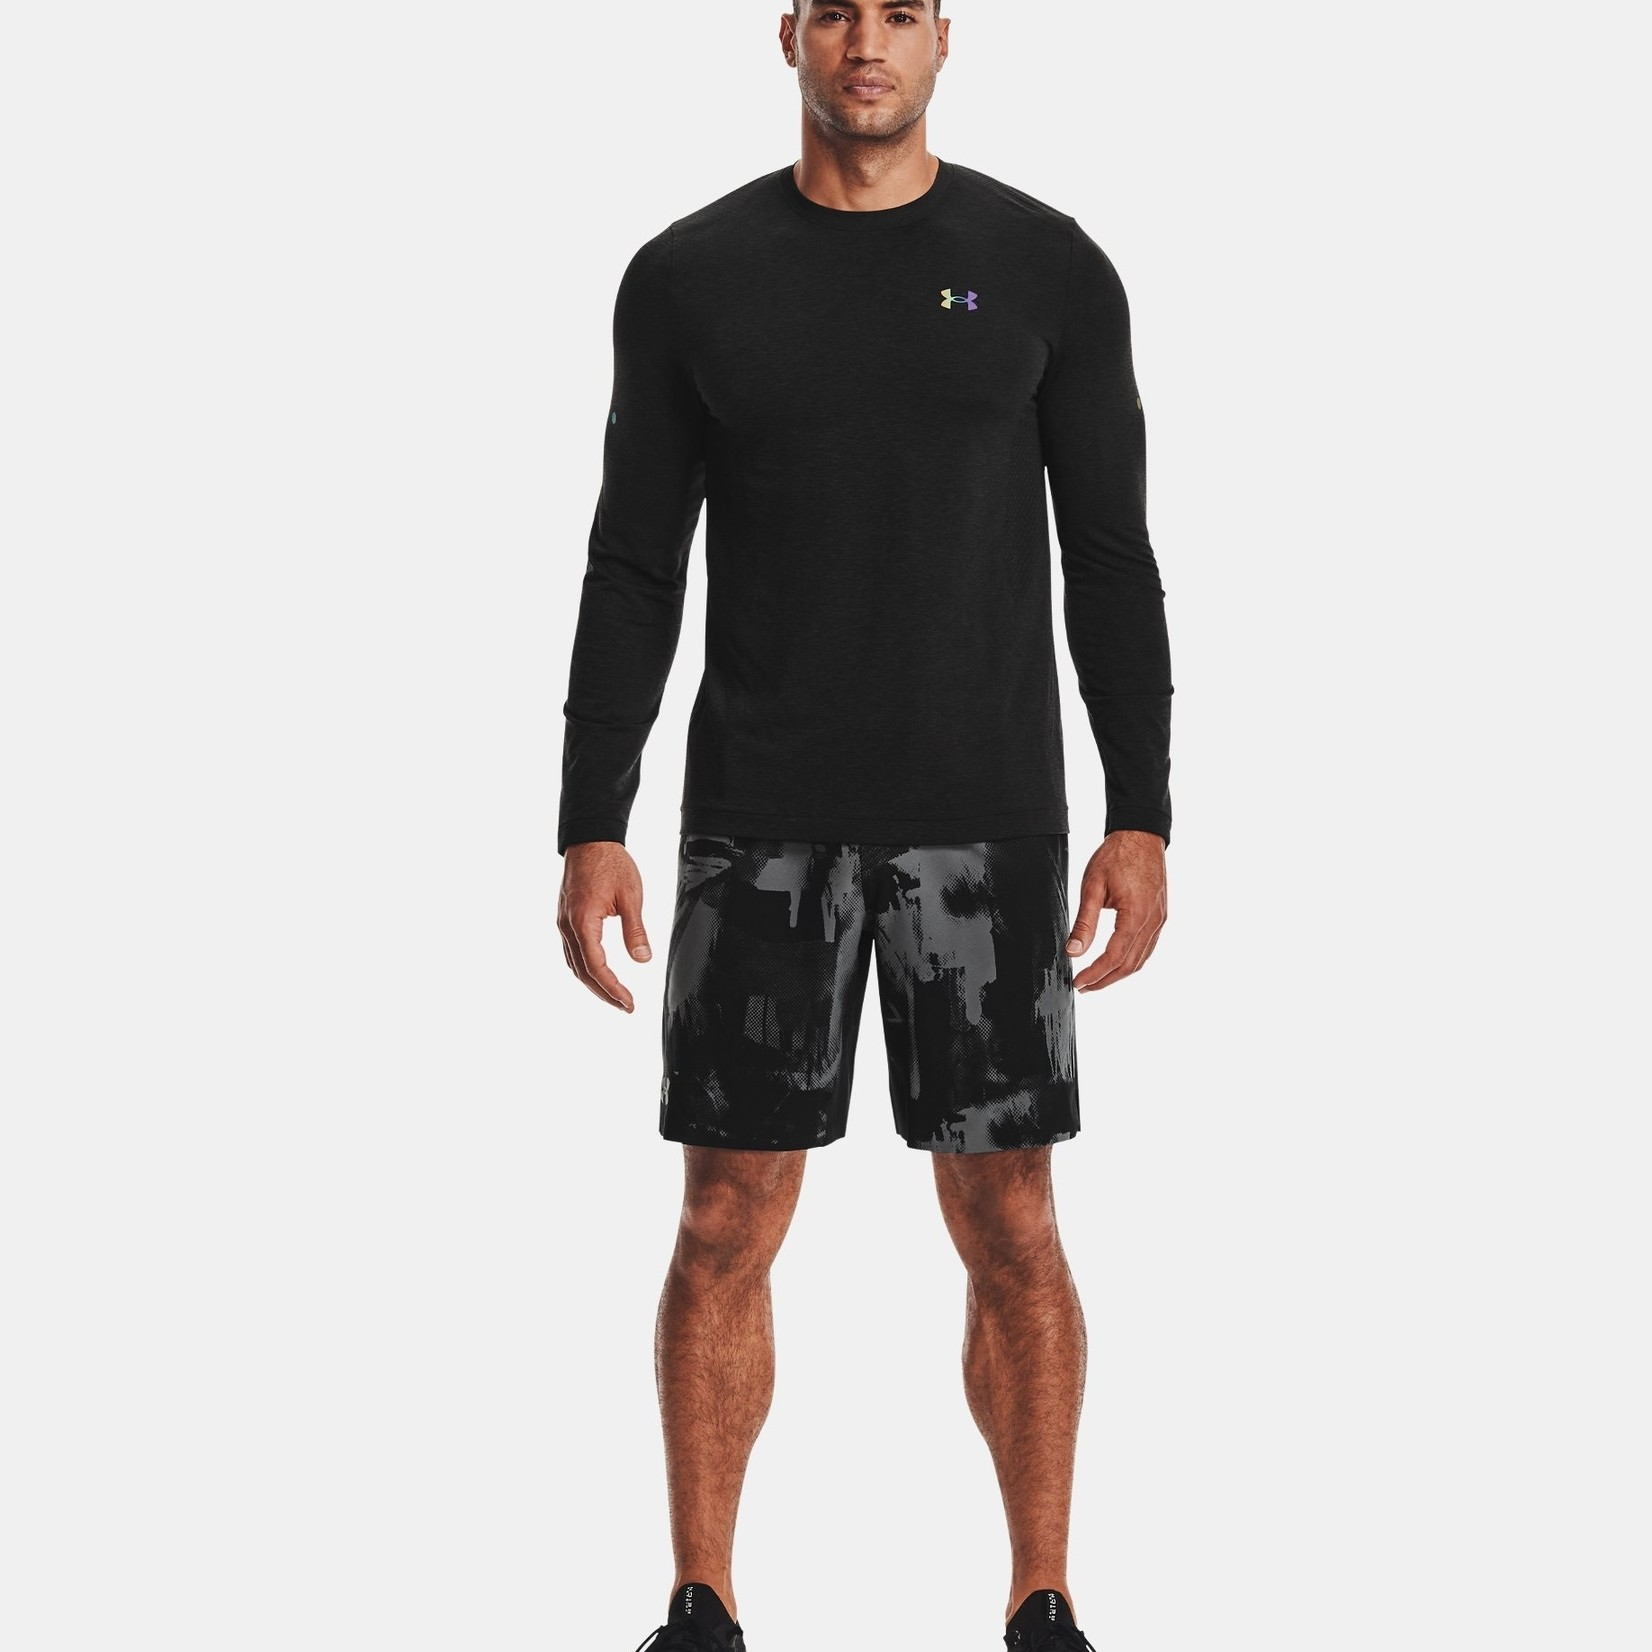 Under Armour UA RUSH™ Seamless Long Sleeve - Black